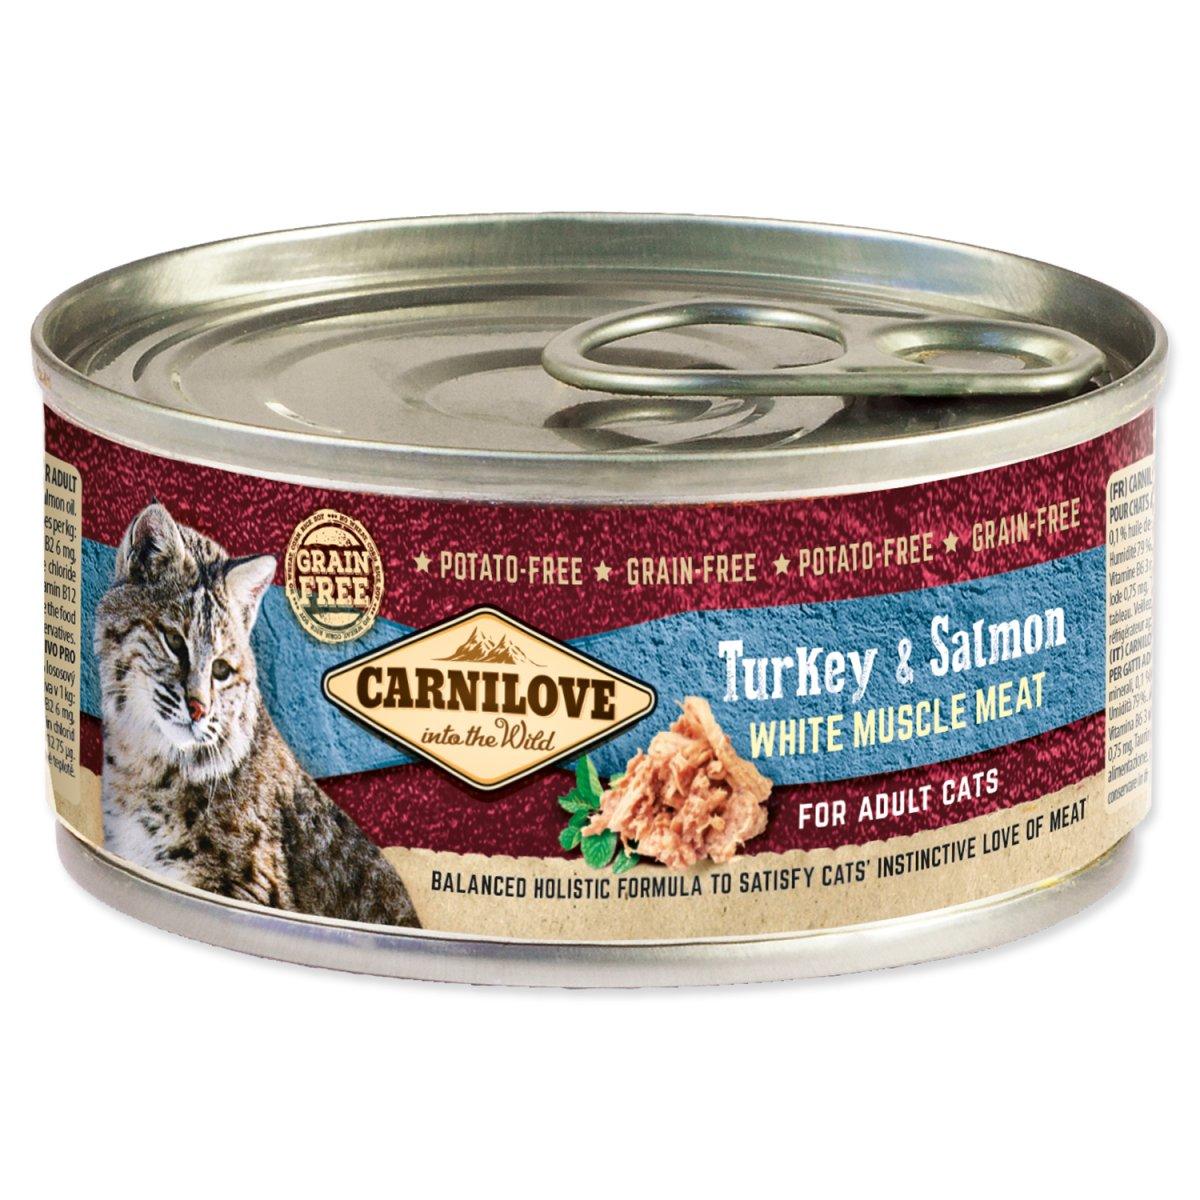 Konzerva CARNILOVE WMM Turkey & Salmon for Adult Cats (100g)